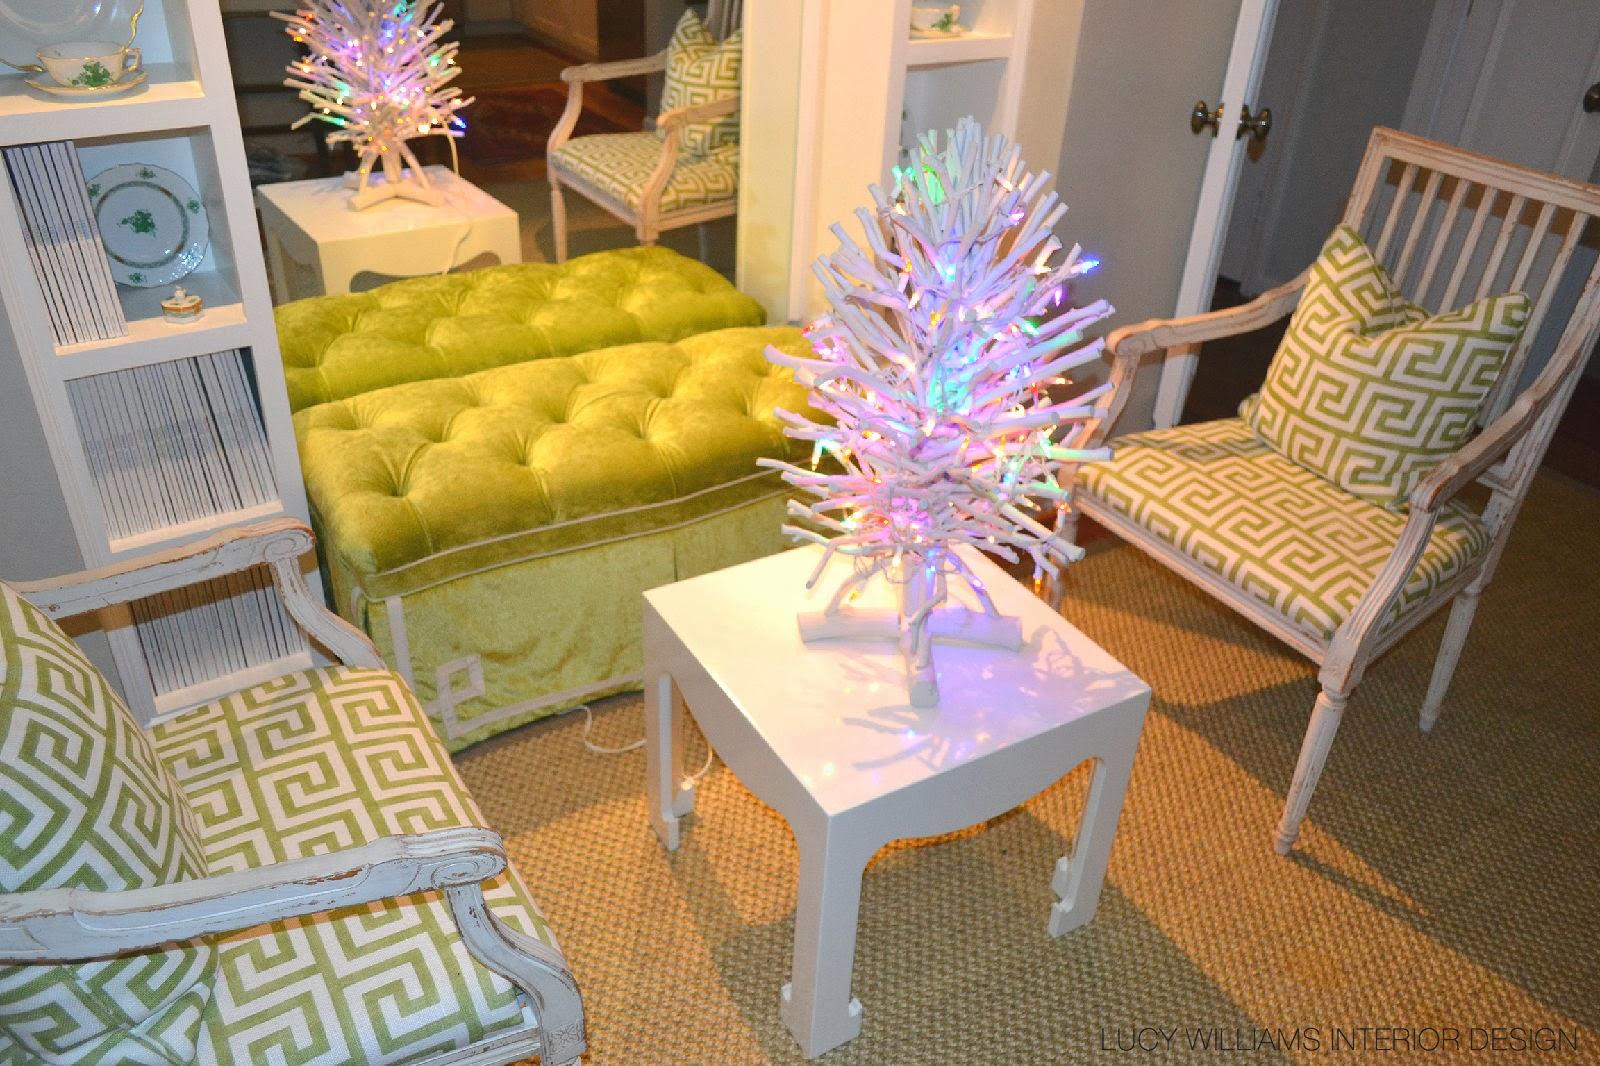 Lucy williams interior design blog december 2013 for Lucy williams interiors